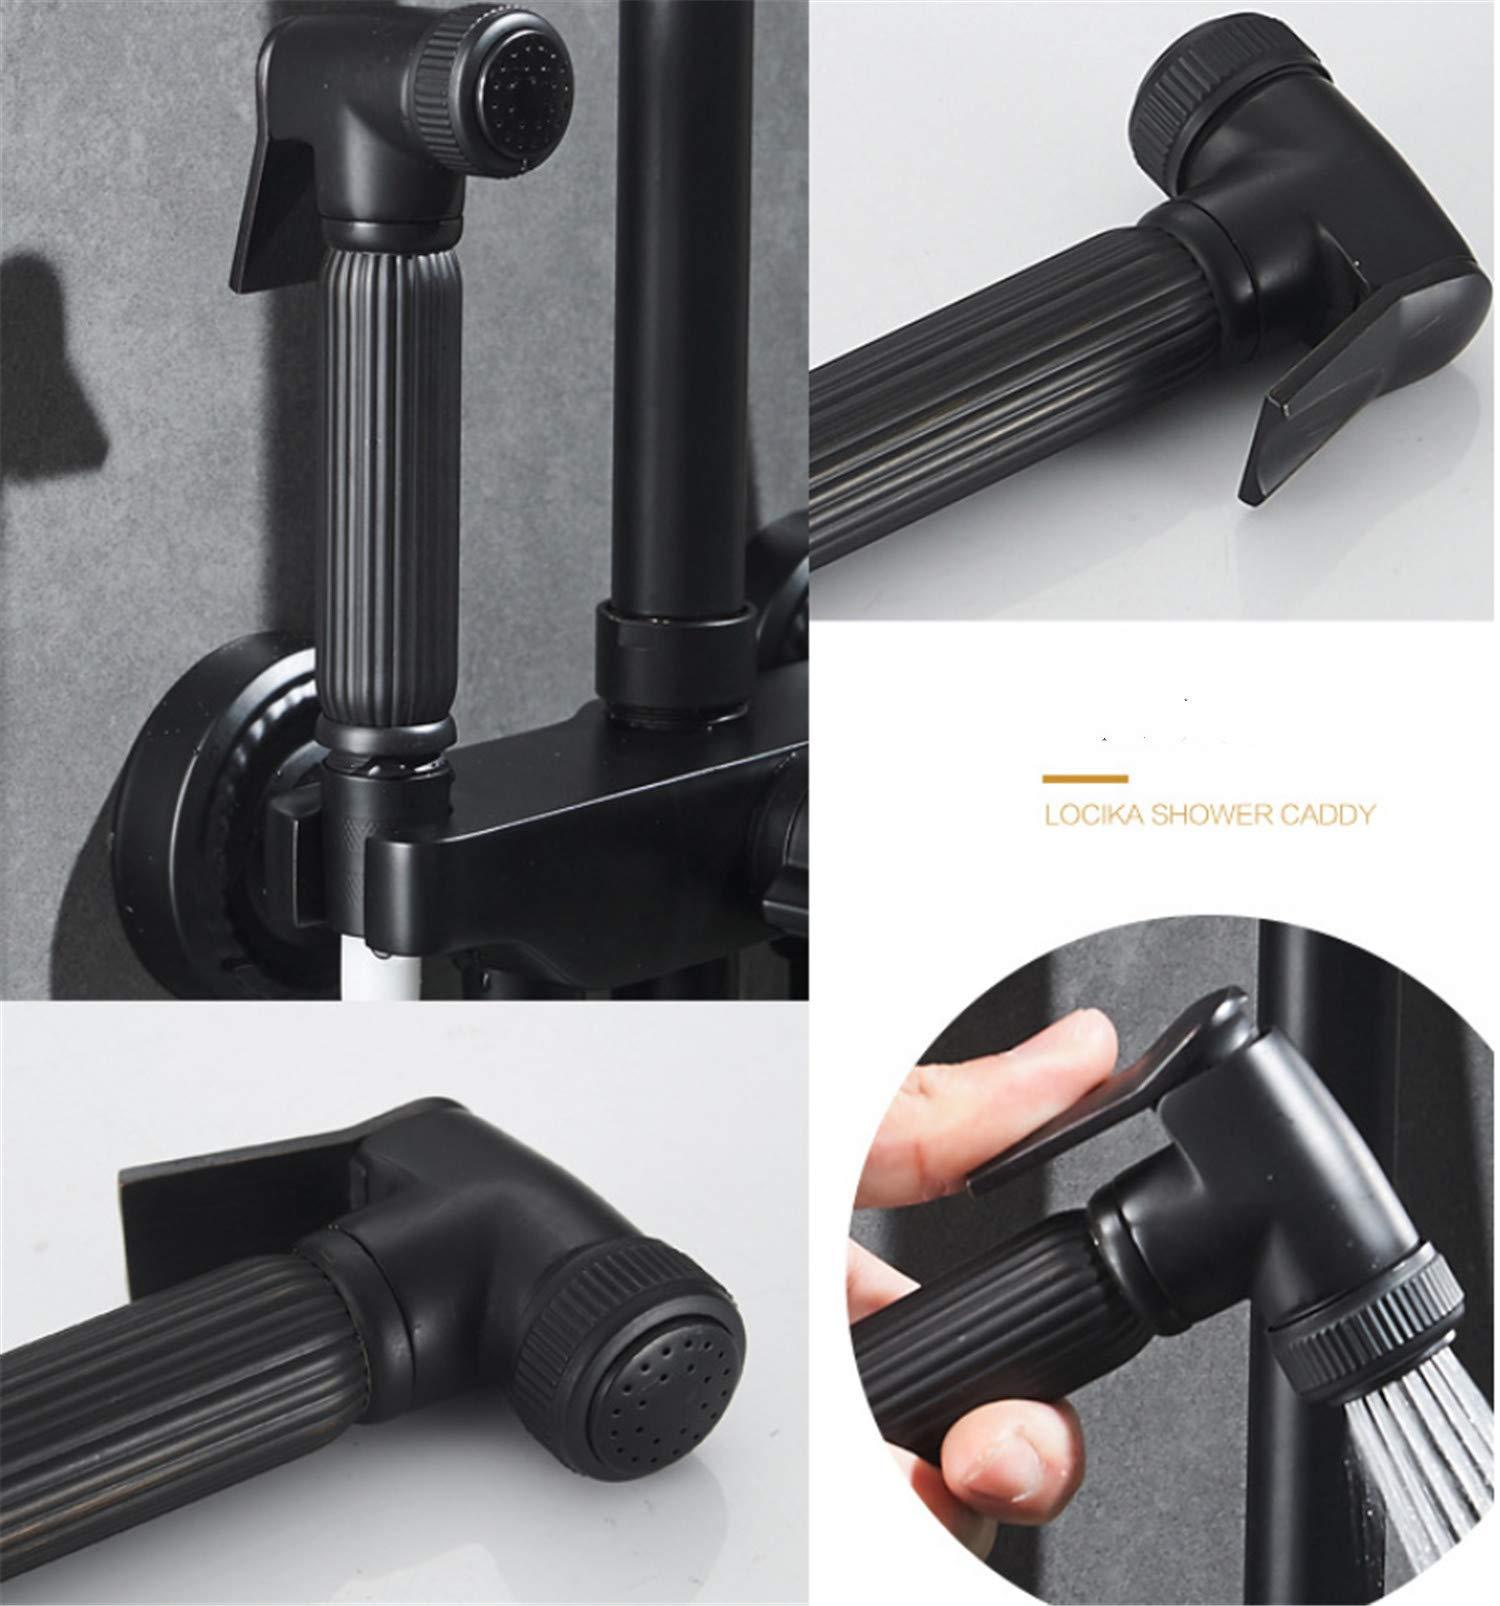 UNIQUE-F Matte Black Brass Body Four-Speed Bathtub Shower Set Rotatable Portable Top Spray Rack Corrosion-Resistant Wear-Resistant by UNIQUE-F (Image #7)